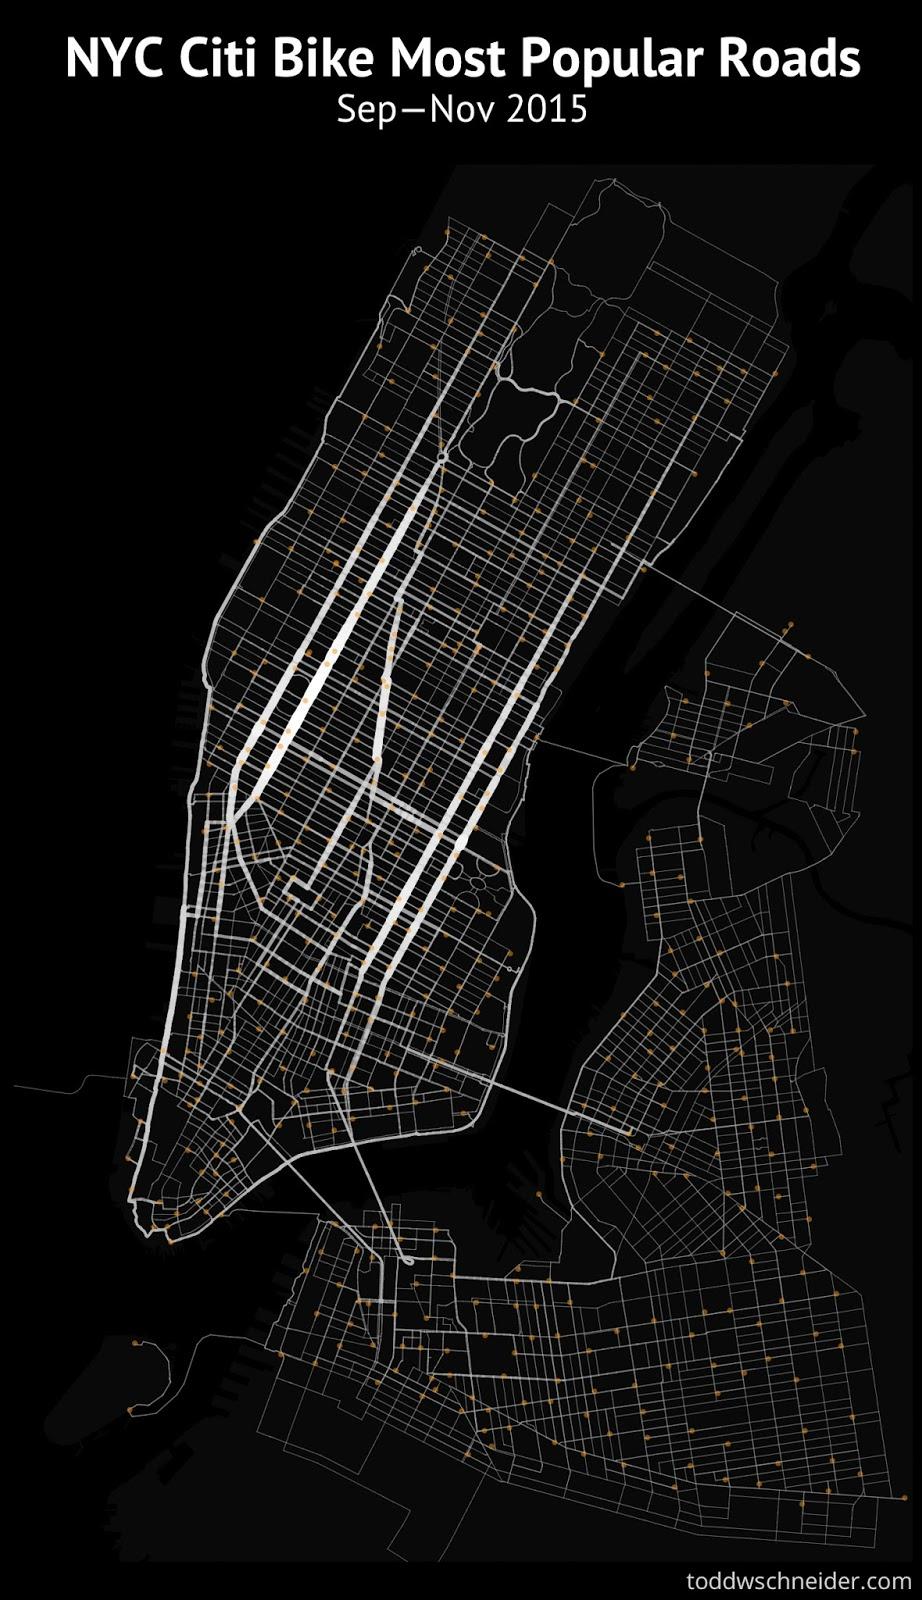 New York Citi bike most popular roads